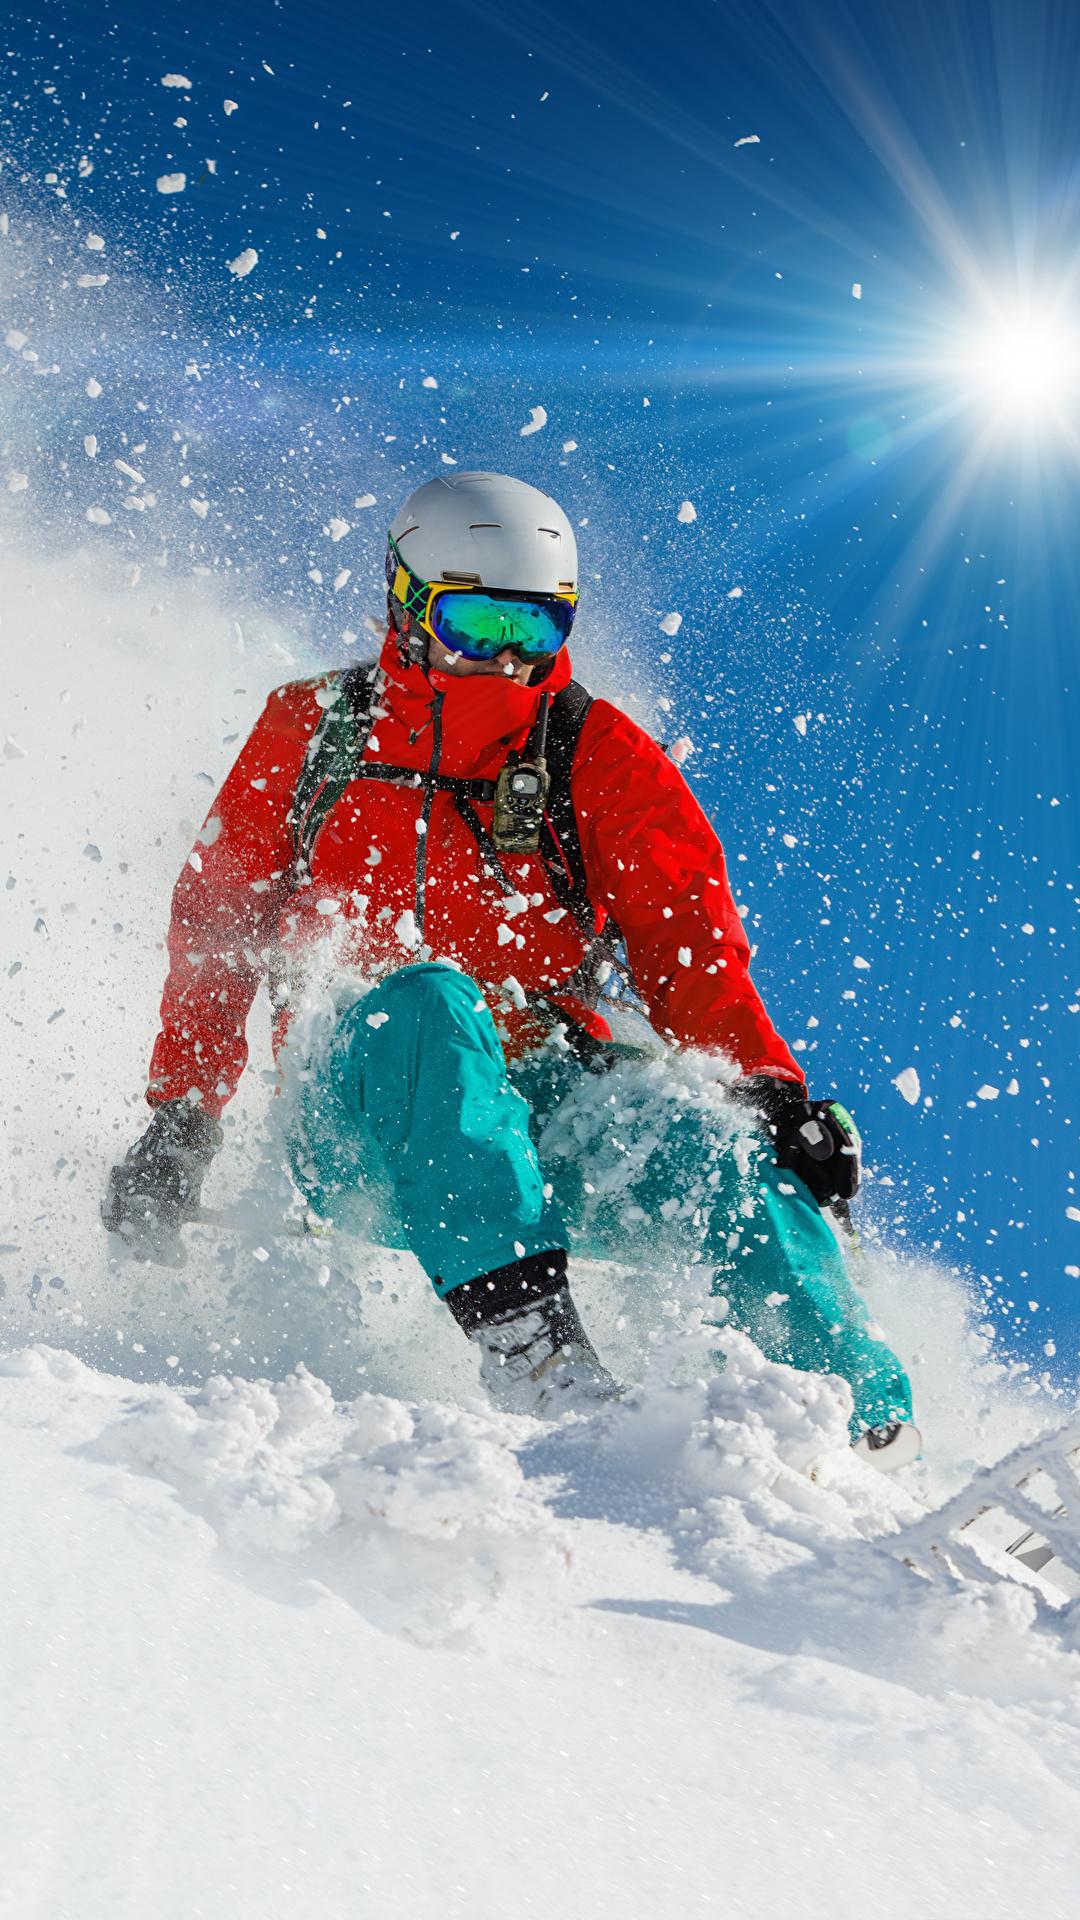 Foto Helm Mann Sport Jacke Sonne Winter Schnee Skisport 1080x1920 sportliches